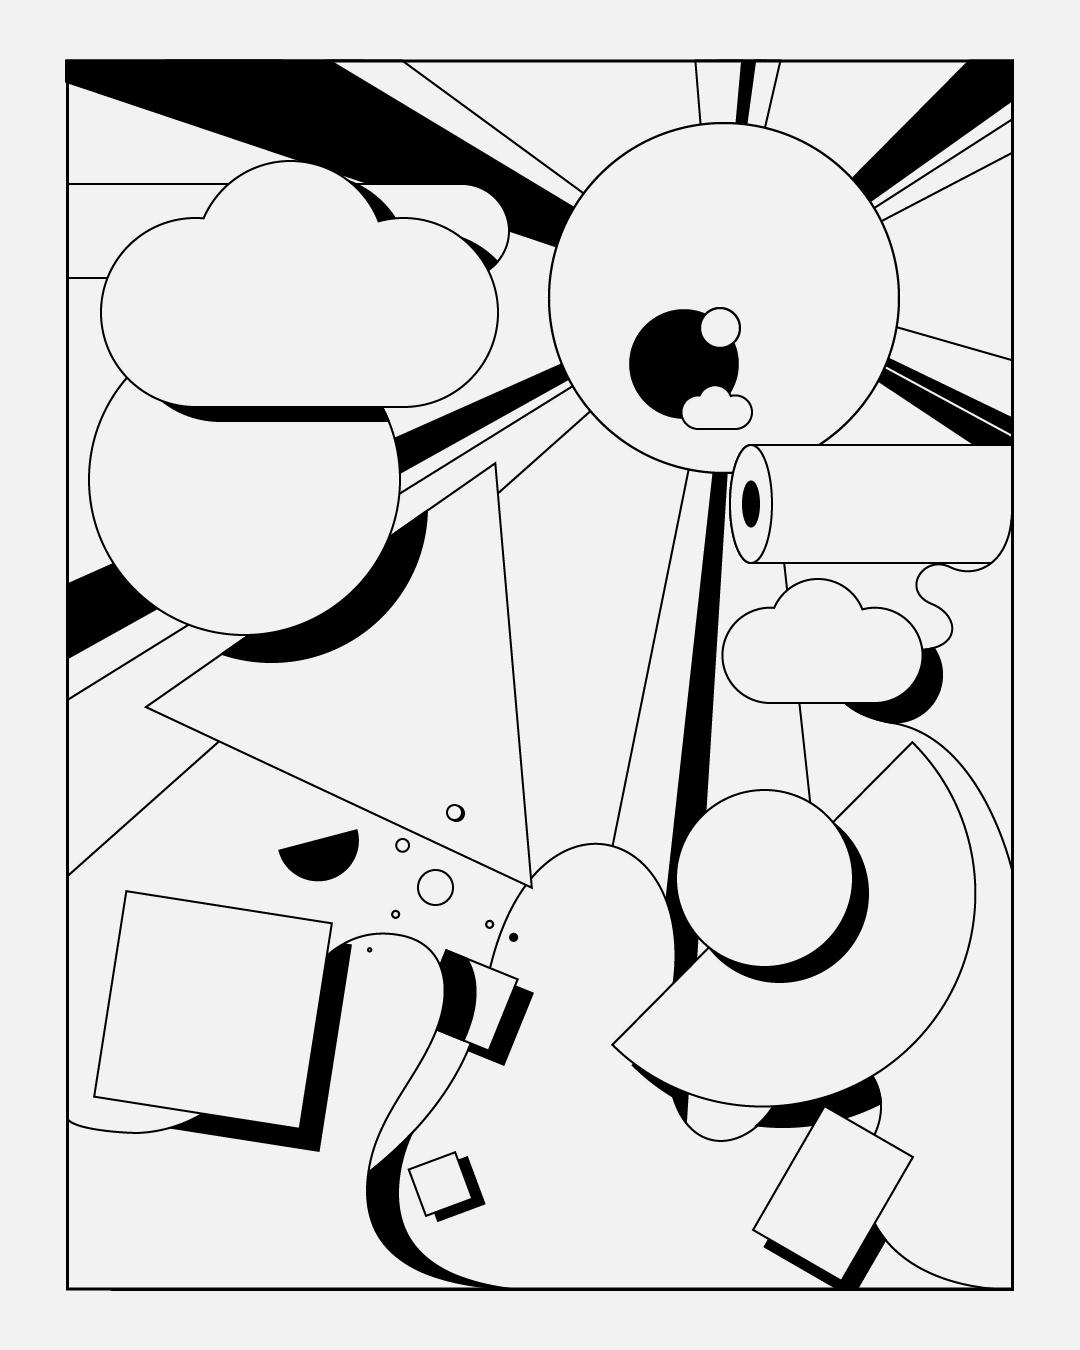 illustration-BNW-01